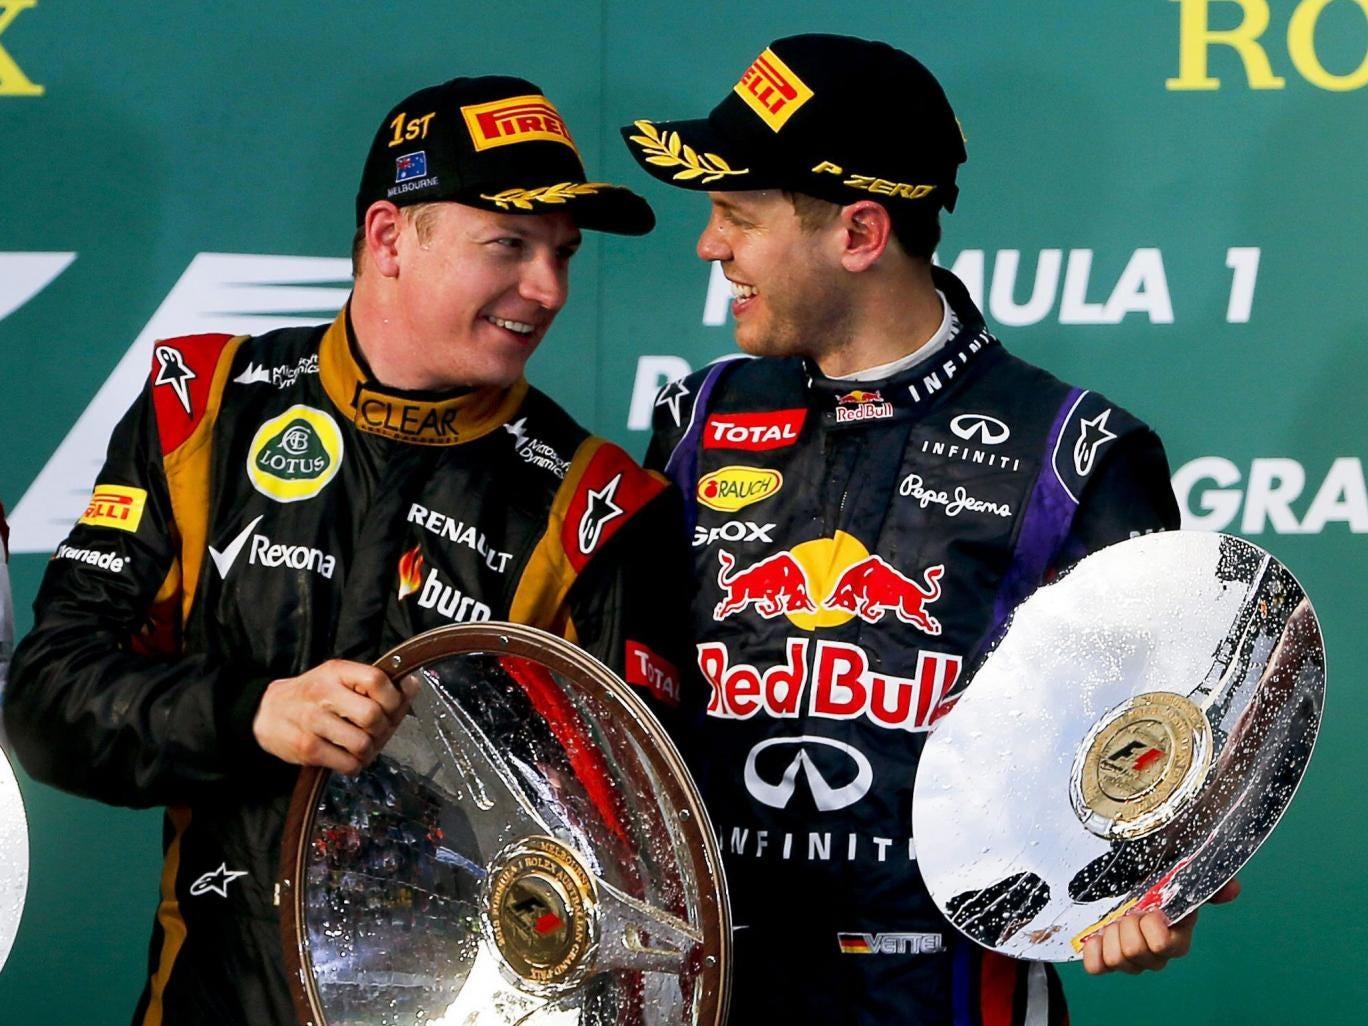 Kimi Raikkonen (left) chats to Sebastian Vettel after winning the opening grand prix of the season in Melbourne yesterday